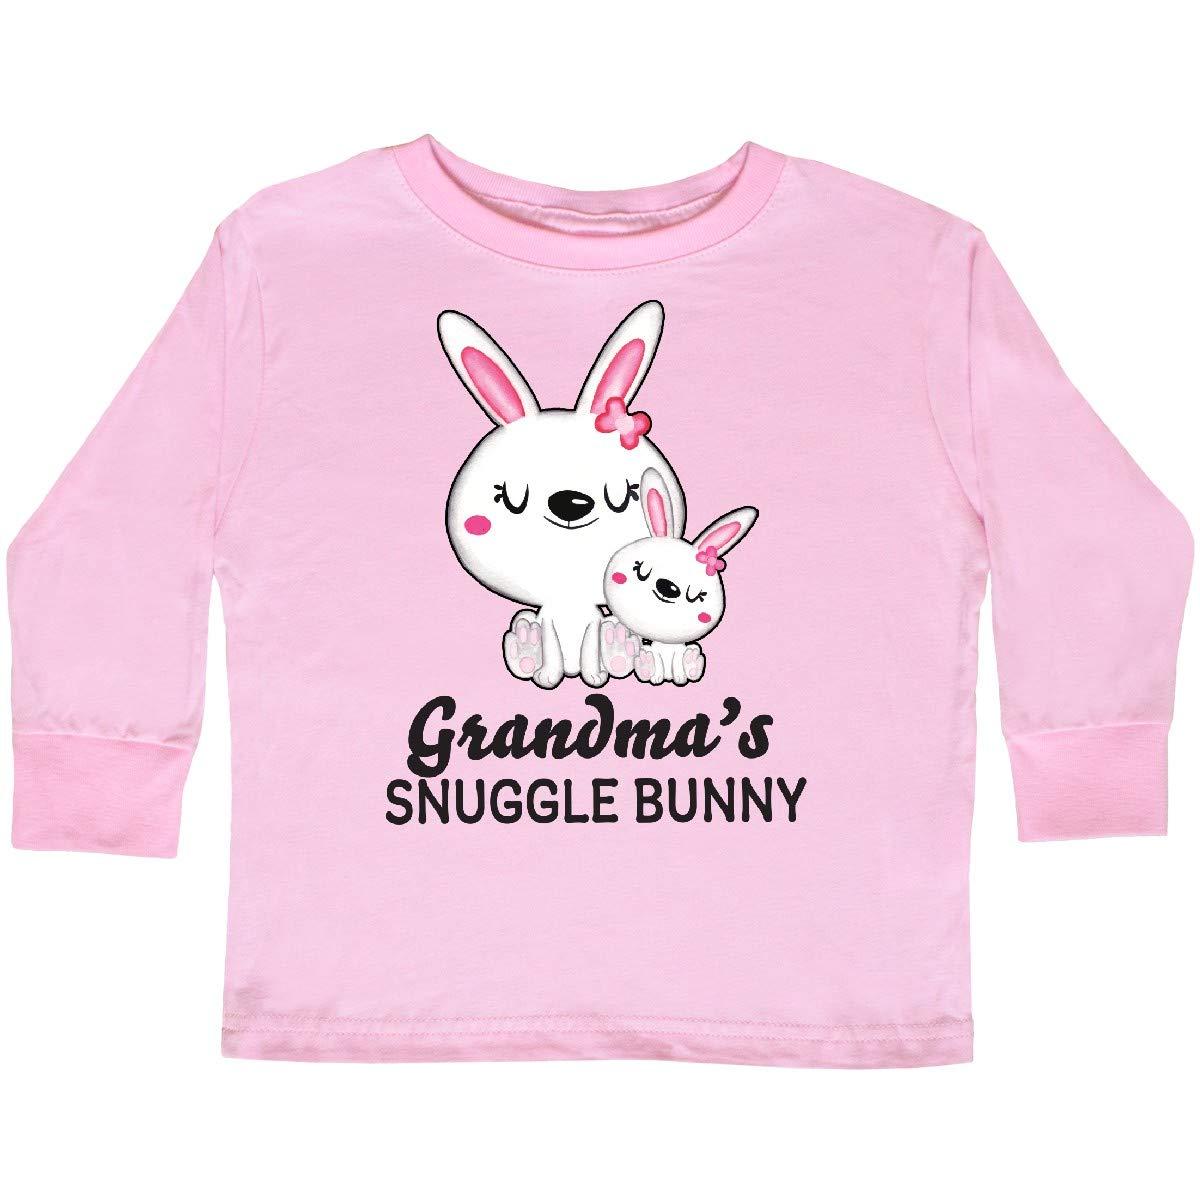 inktastic Grandmas Snuggle Bunny Easter Toddler Long Sleeve T-Shirt